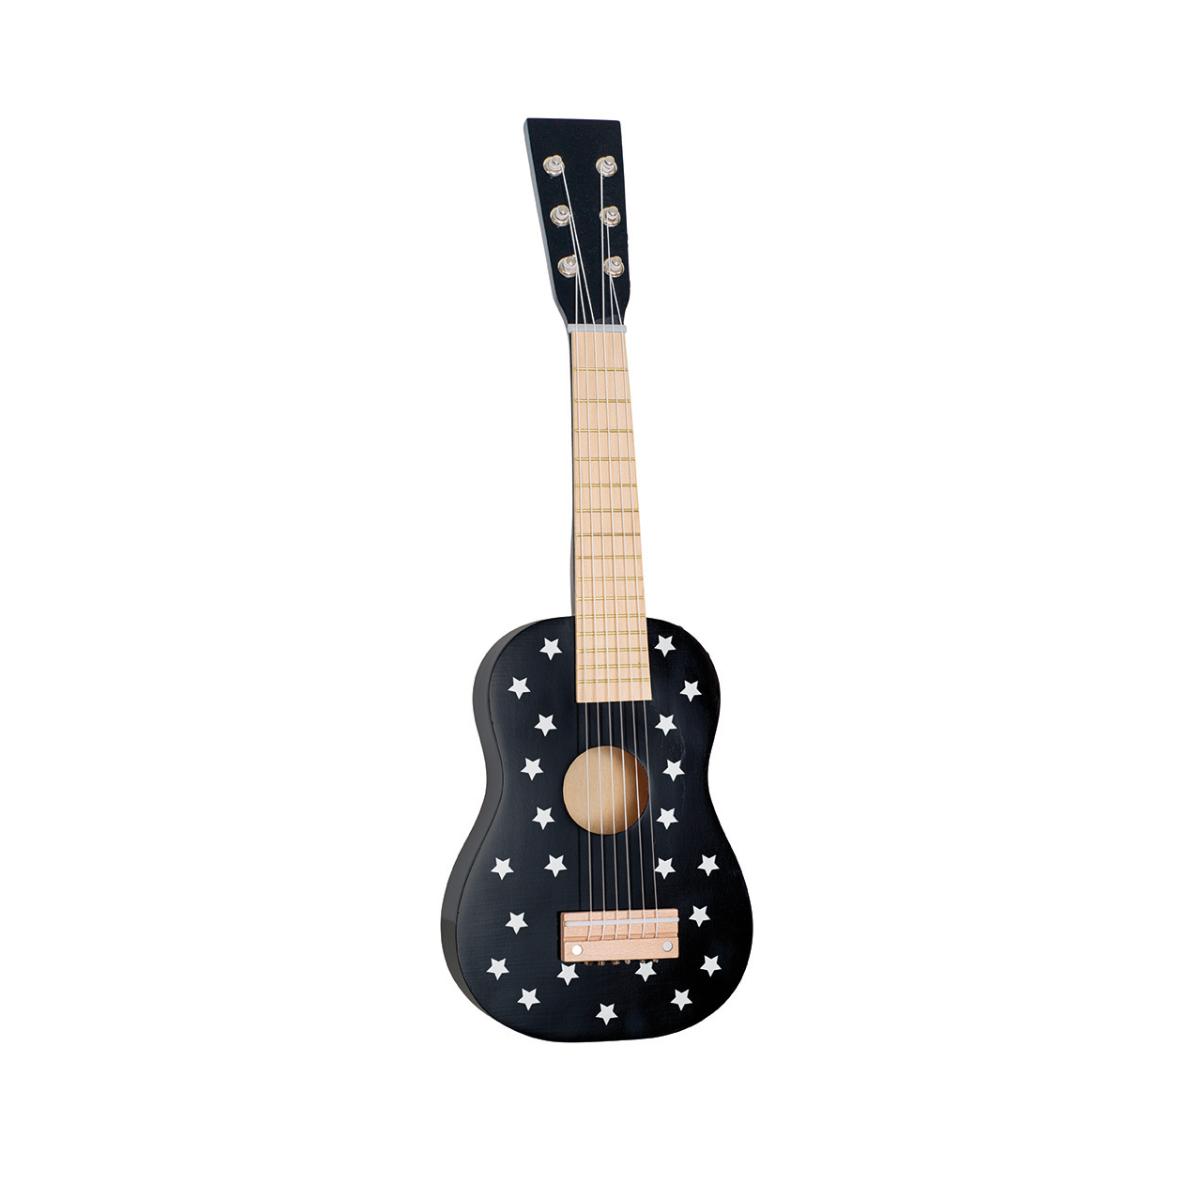 Jabadabado: Ξύλινη Κιθάρα Μαύρη